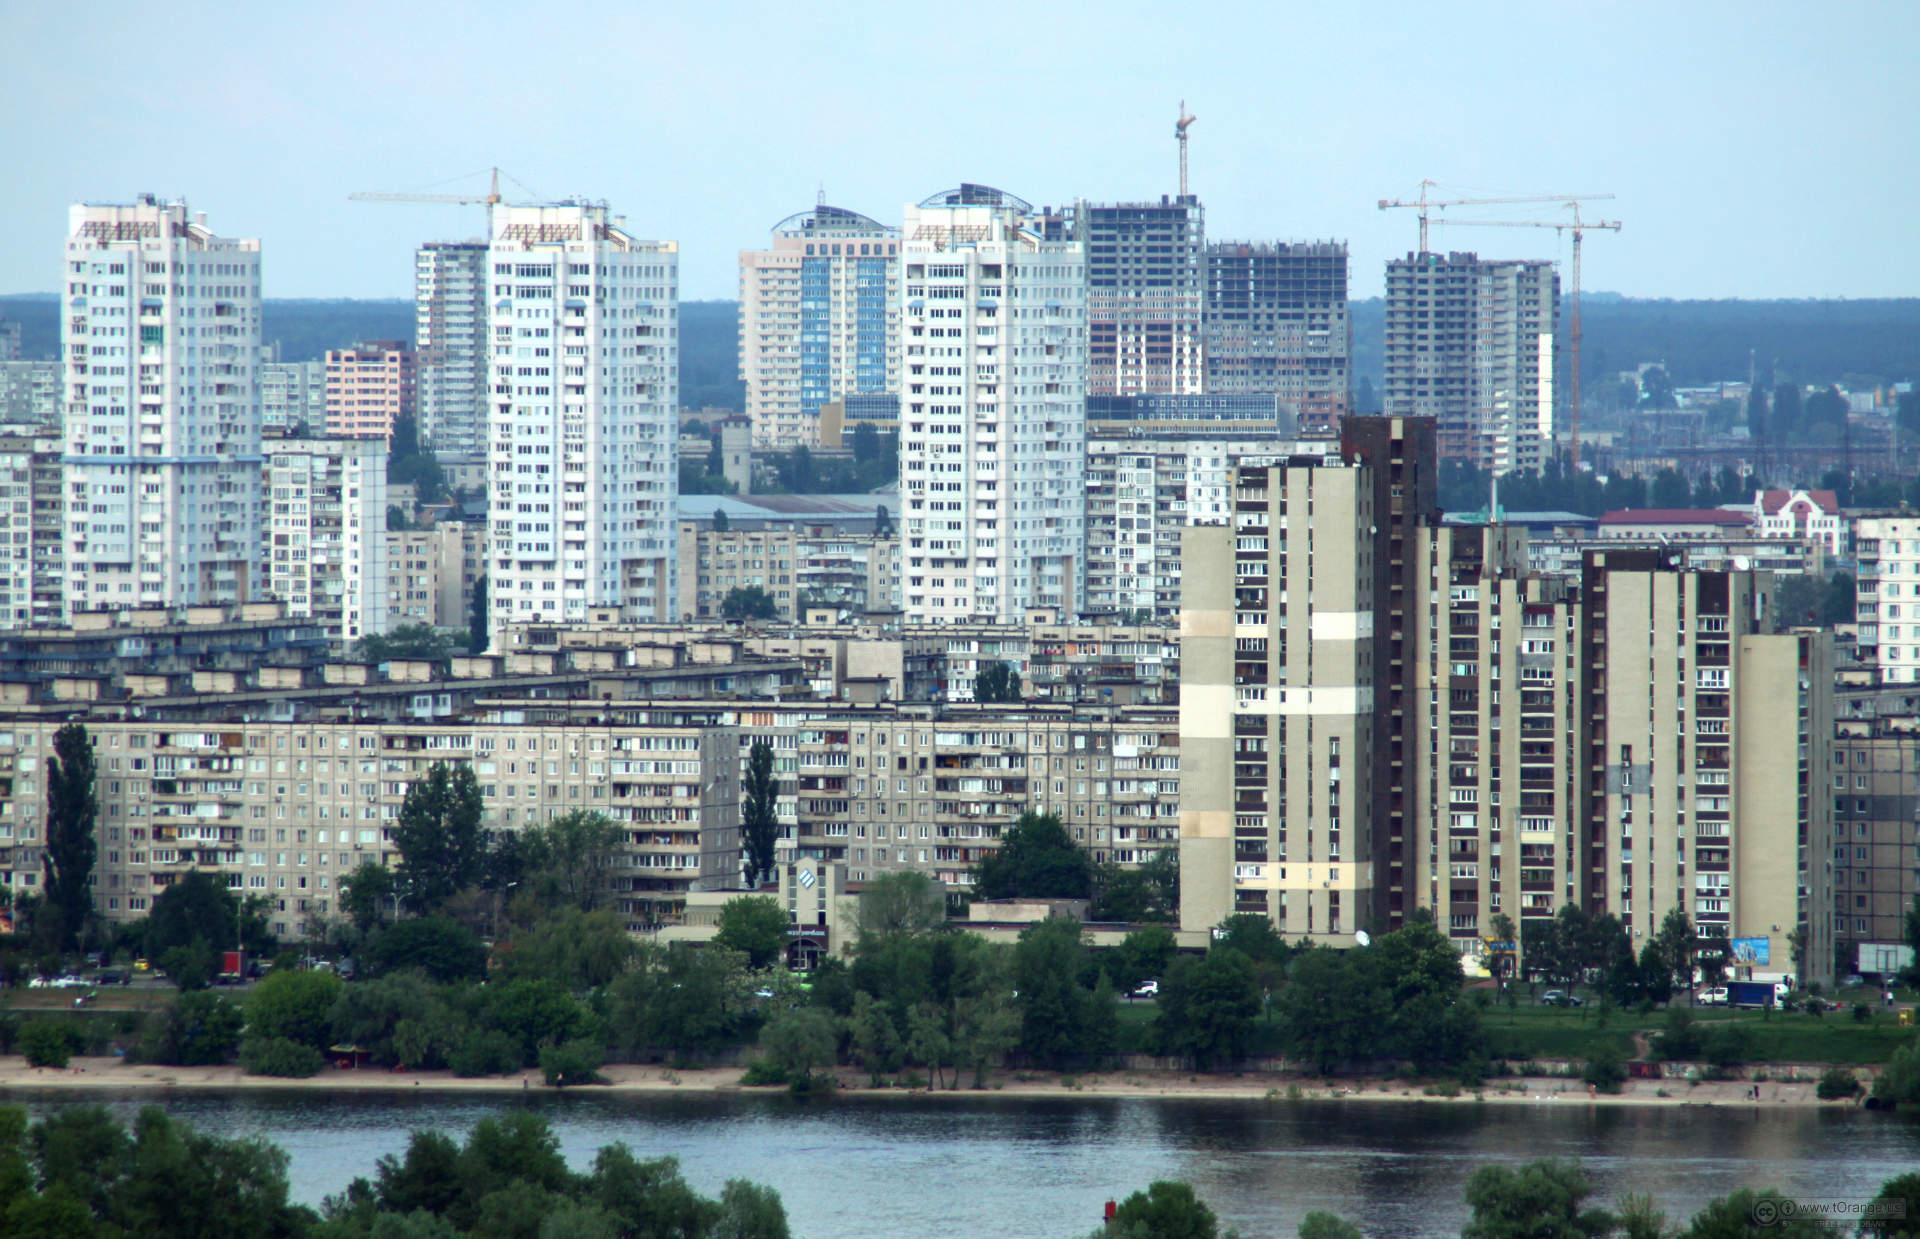 Thane's Vartak Nagar – a new real estate hotspot emerges in MMR